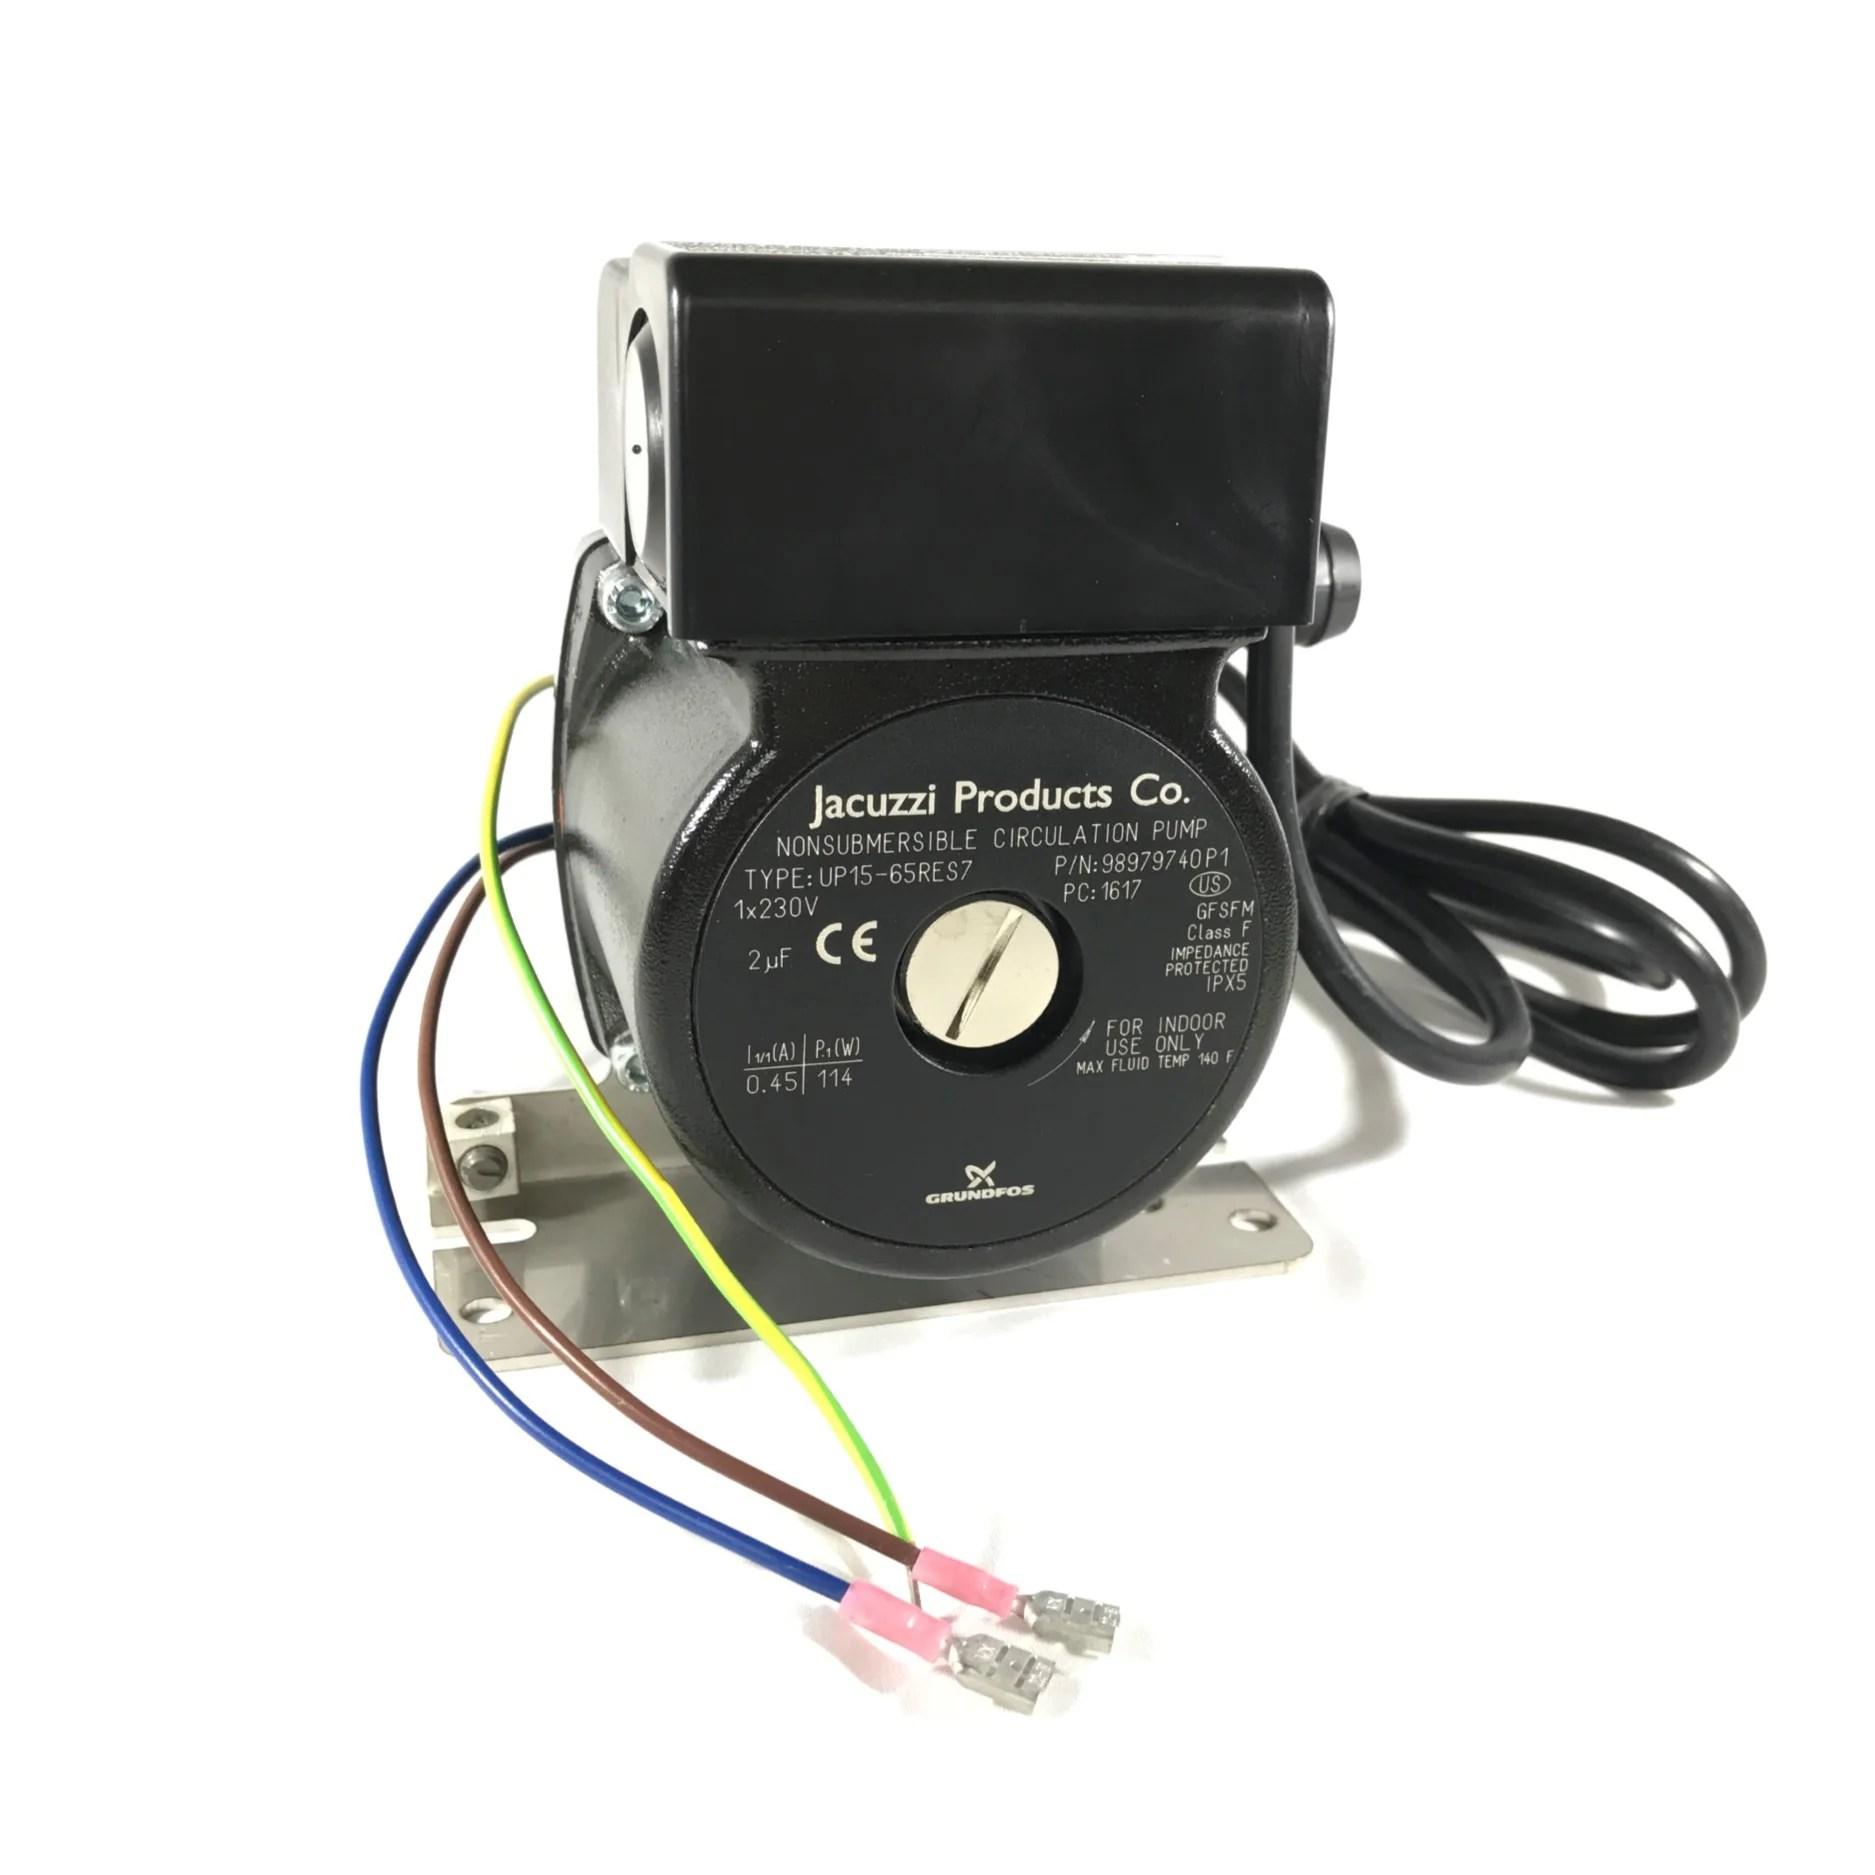 hight resolution of jacuzzi hot tub circulation pump 240vac 50hz part no 6000 125